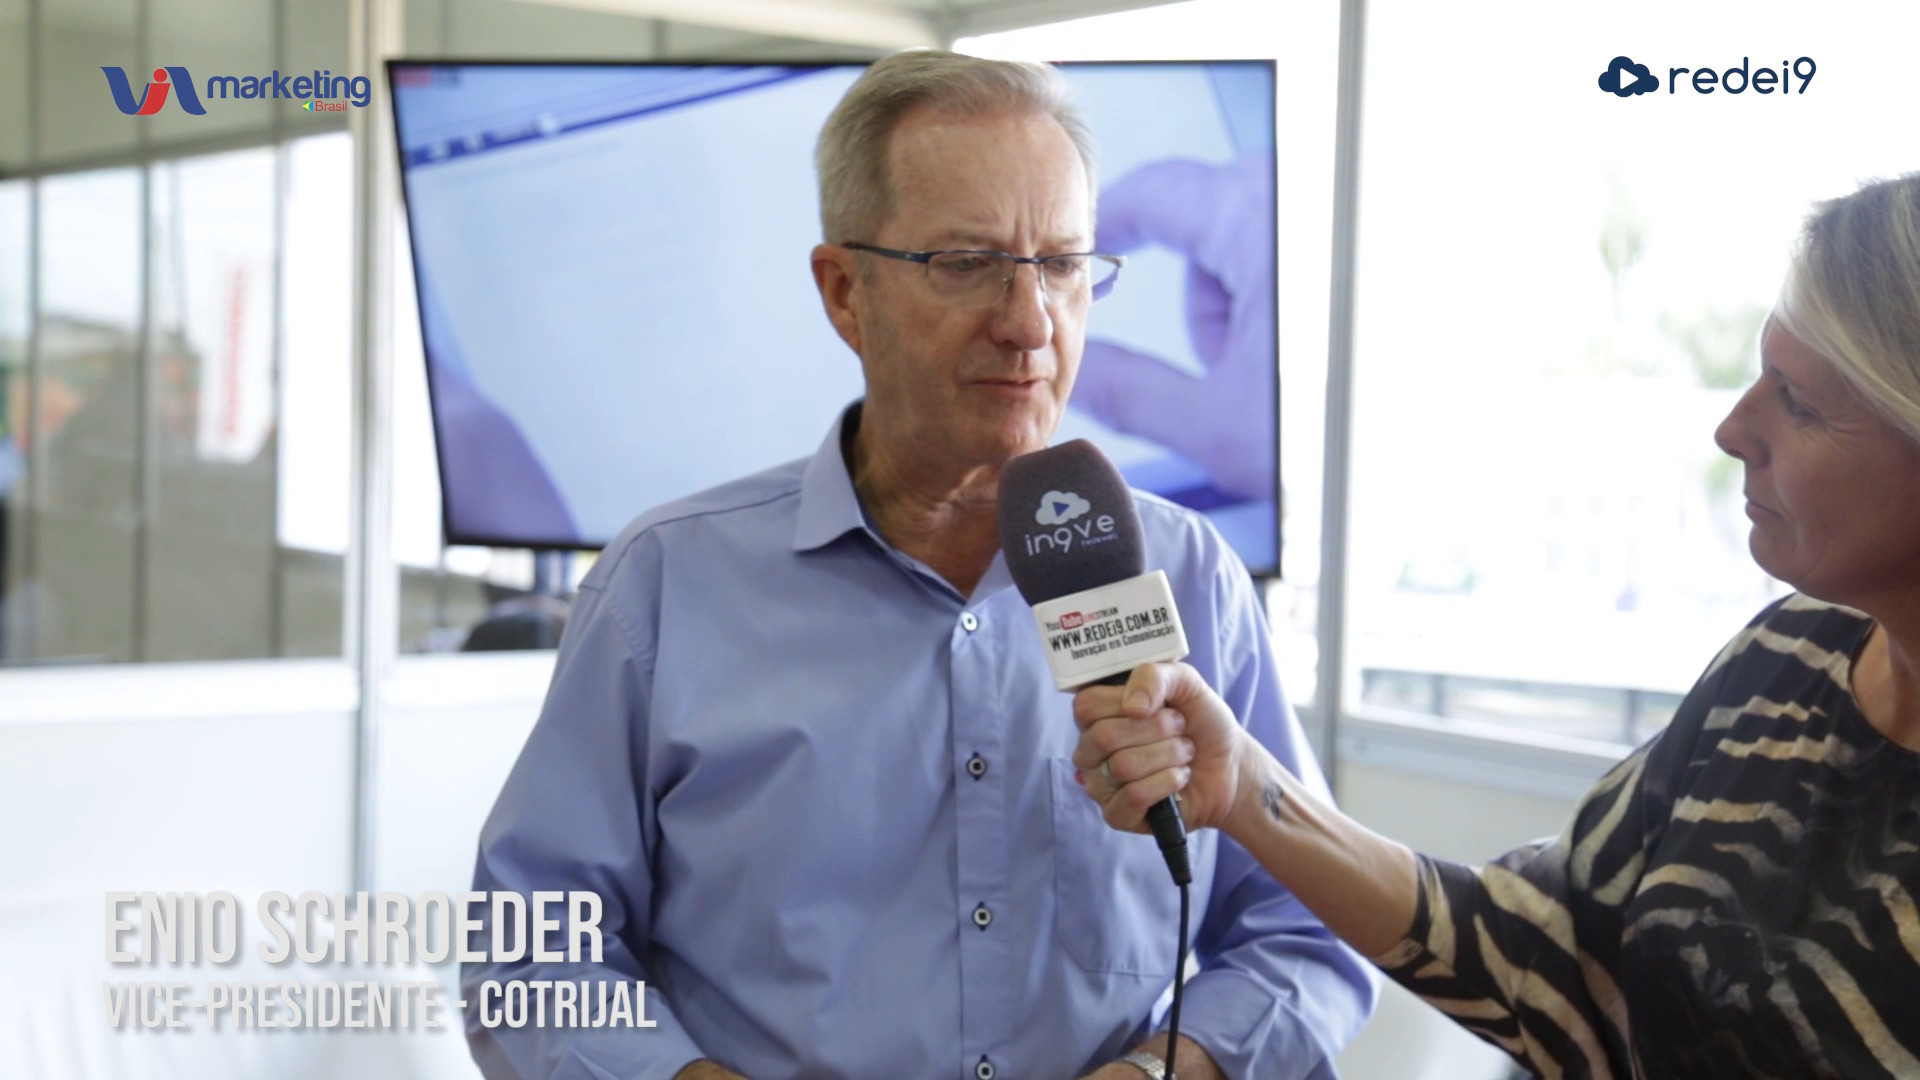 Enio Schoeder – Vice-presidente da Cotrijal na Expodireto 2020